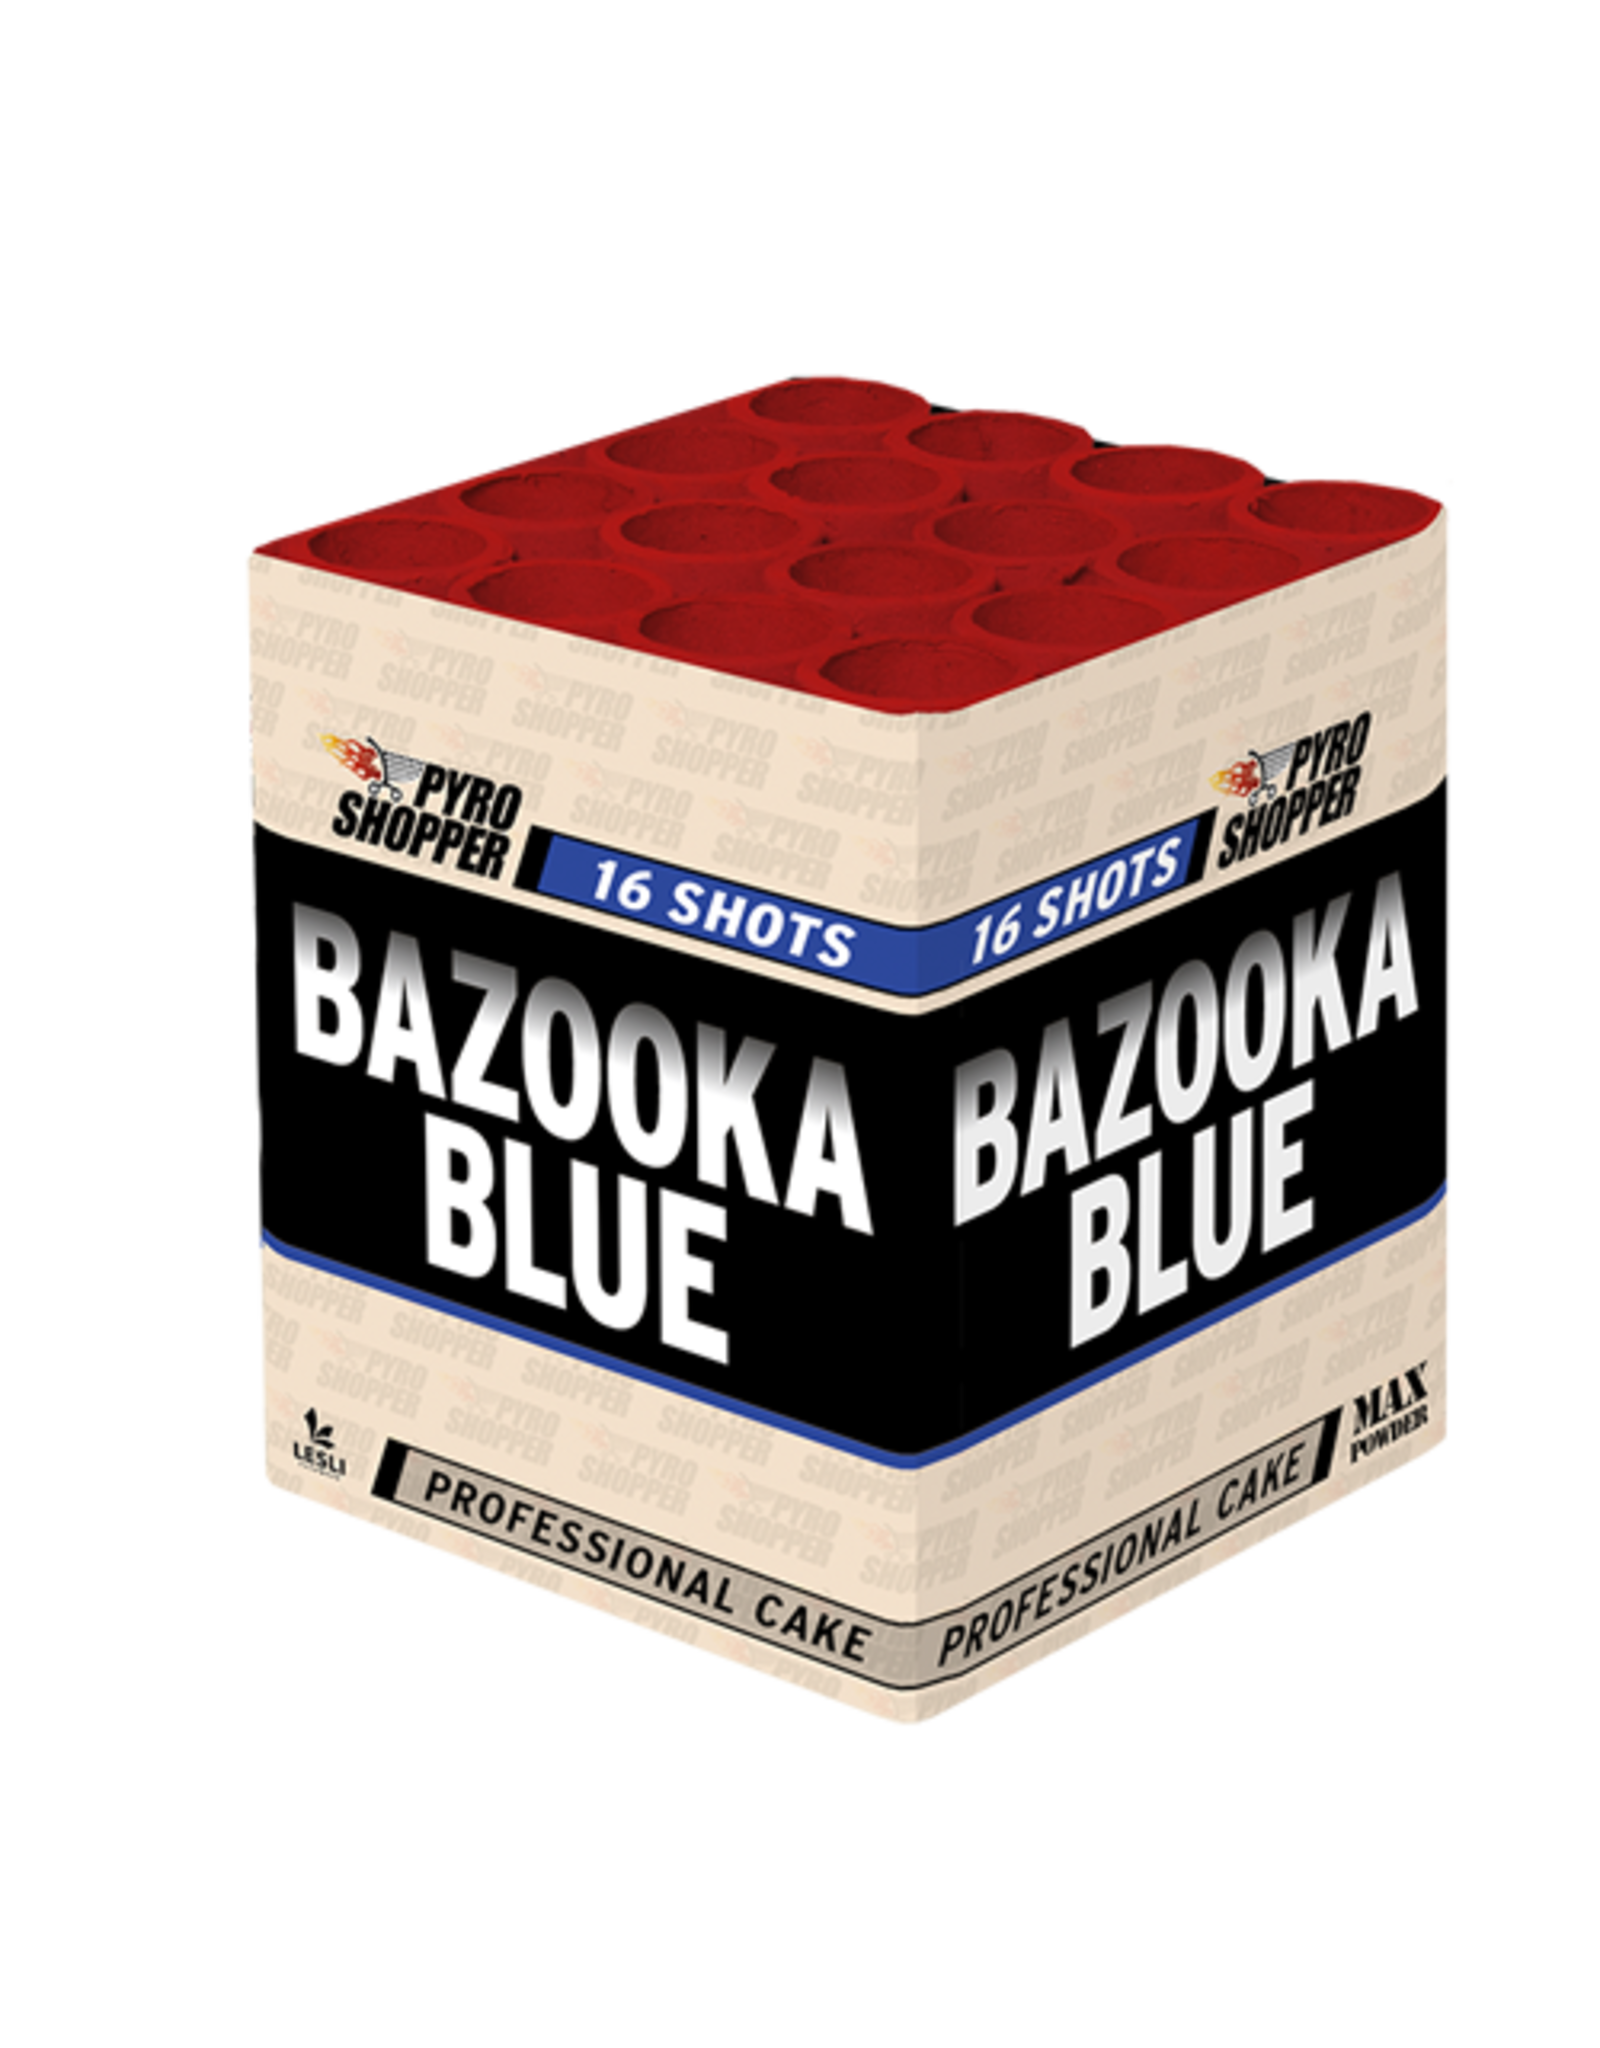 Lesli Vuurwerk Bazooka Blue 16 shots